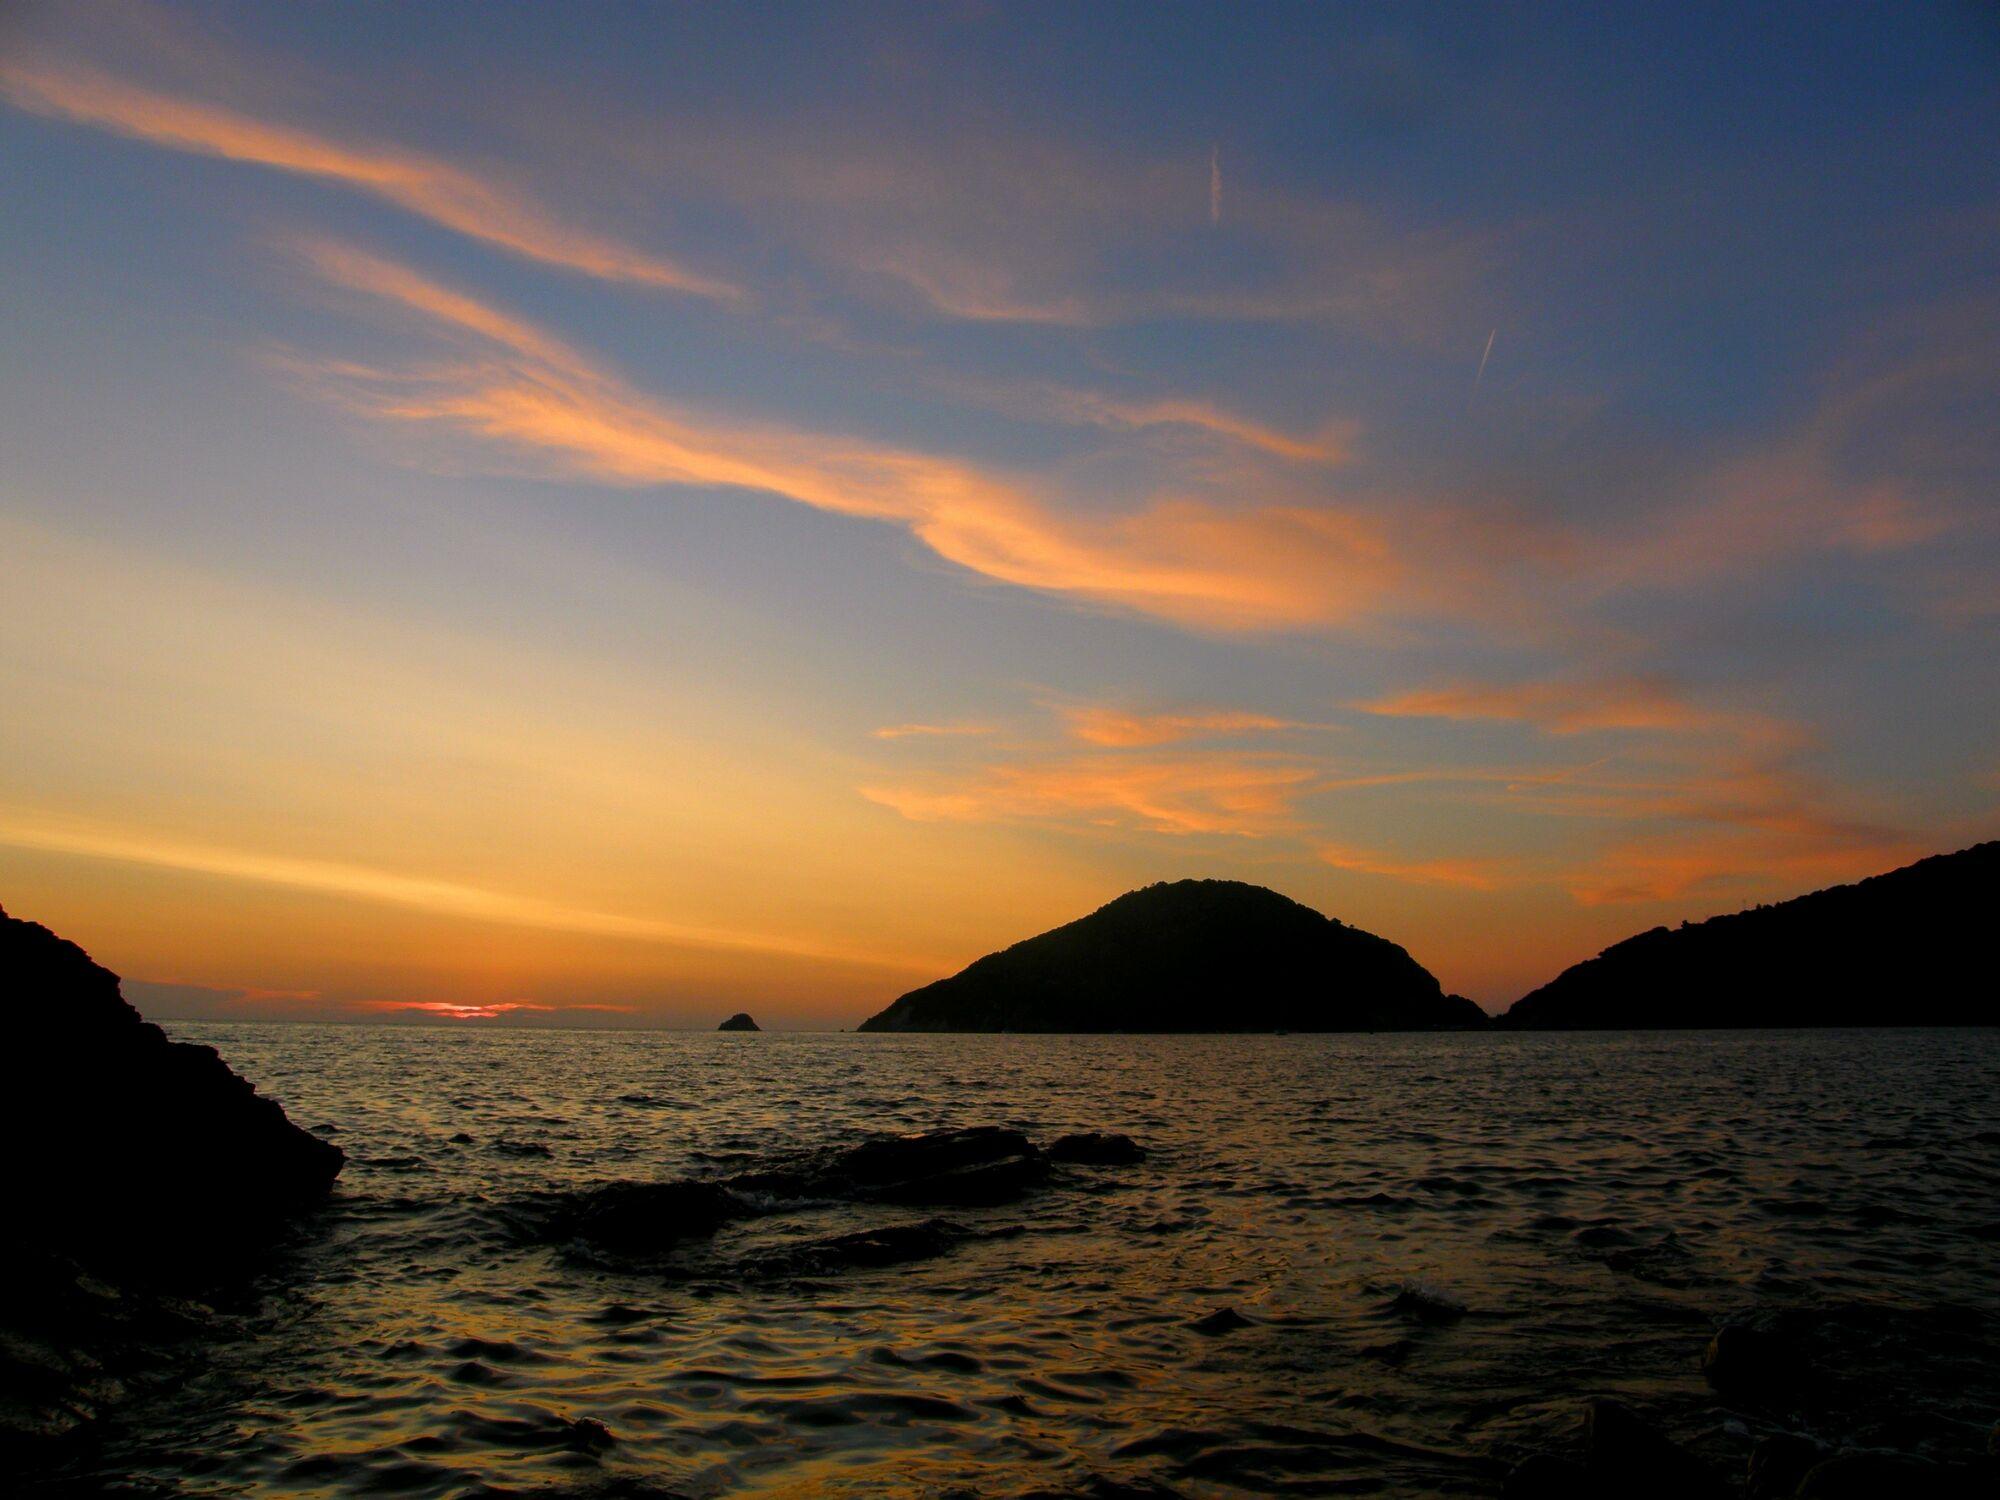 Bild mit Wasser, Wellen, Sonnenuntergang, Sonnenaufgang, Meer, Am Meer